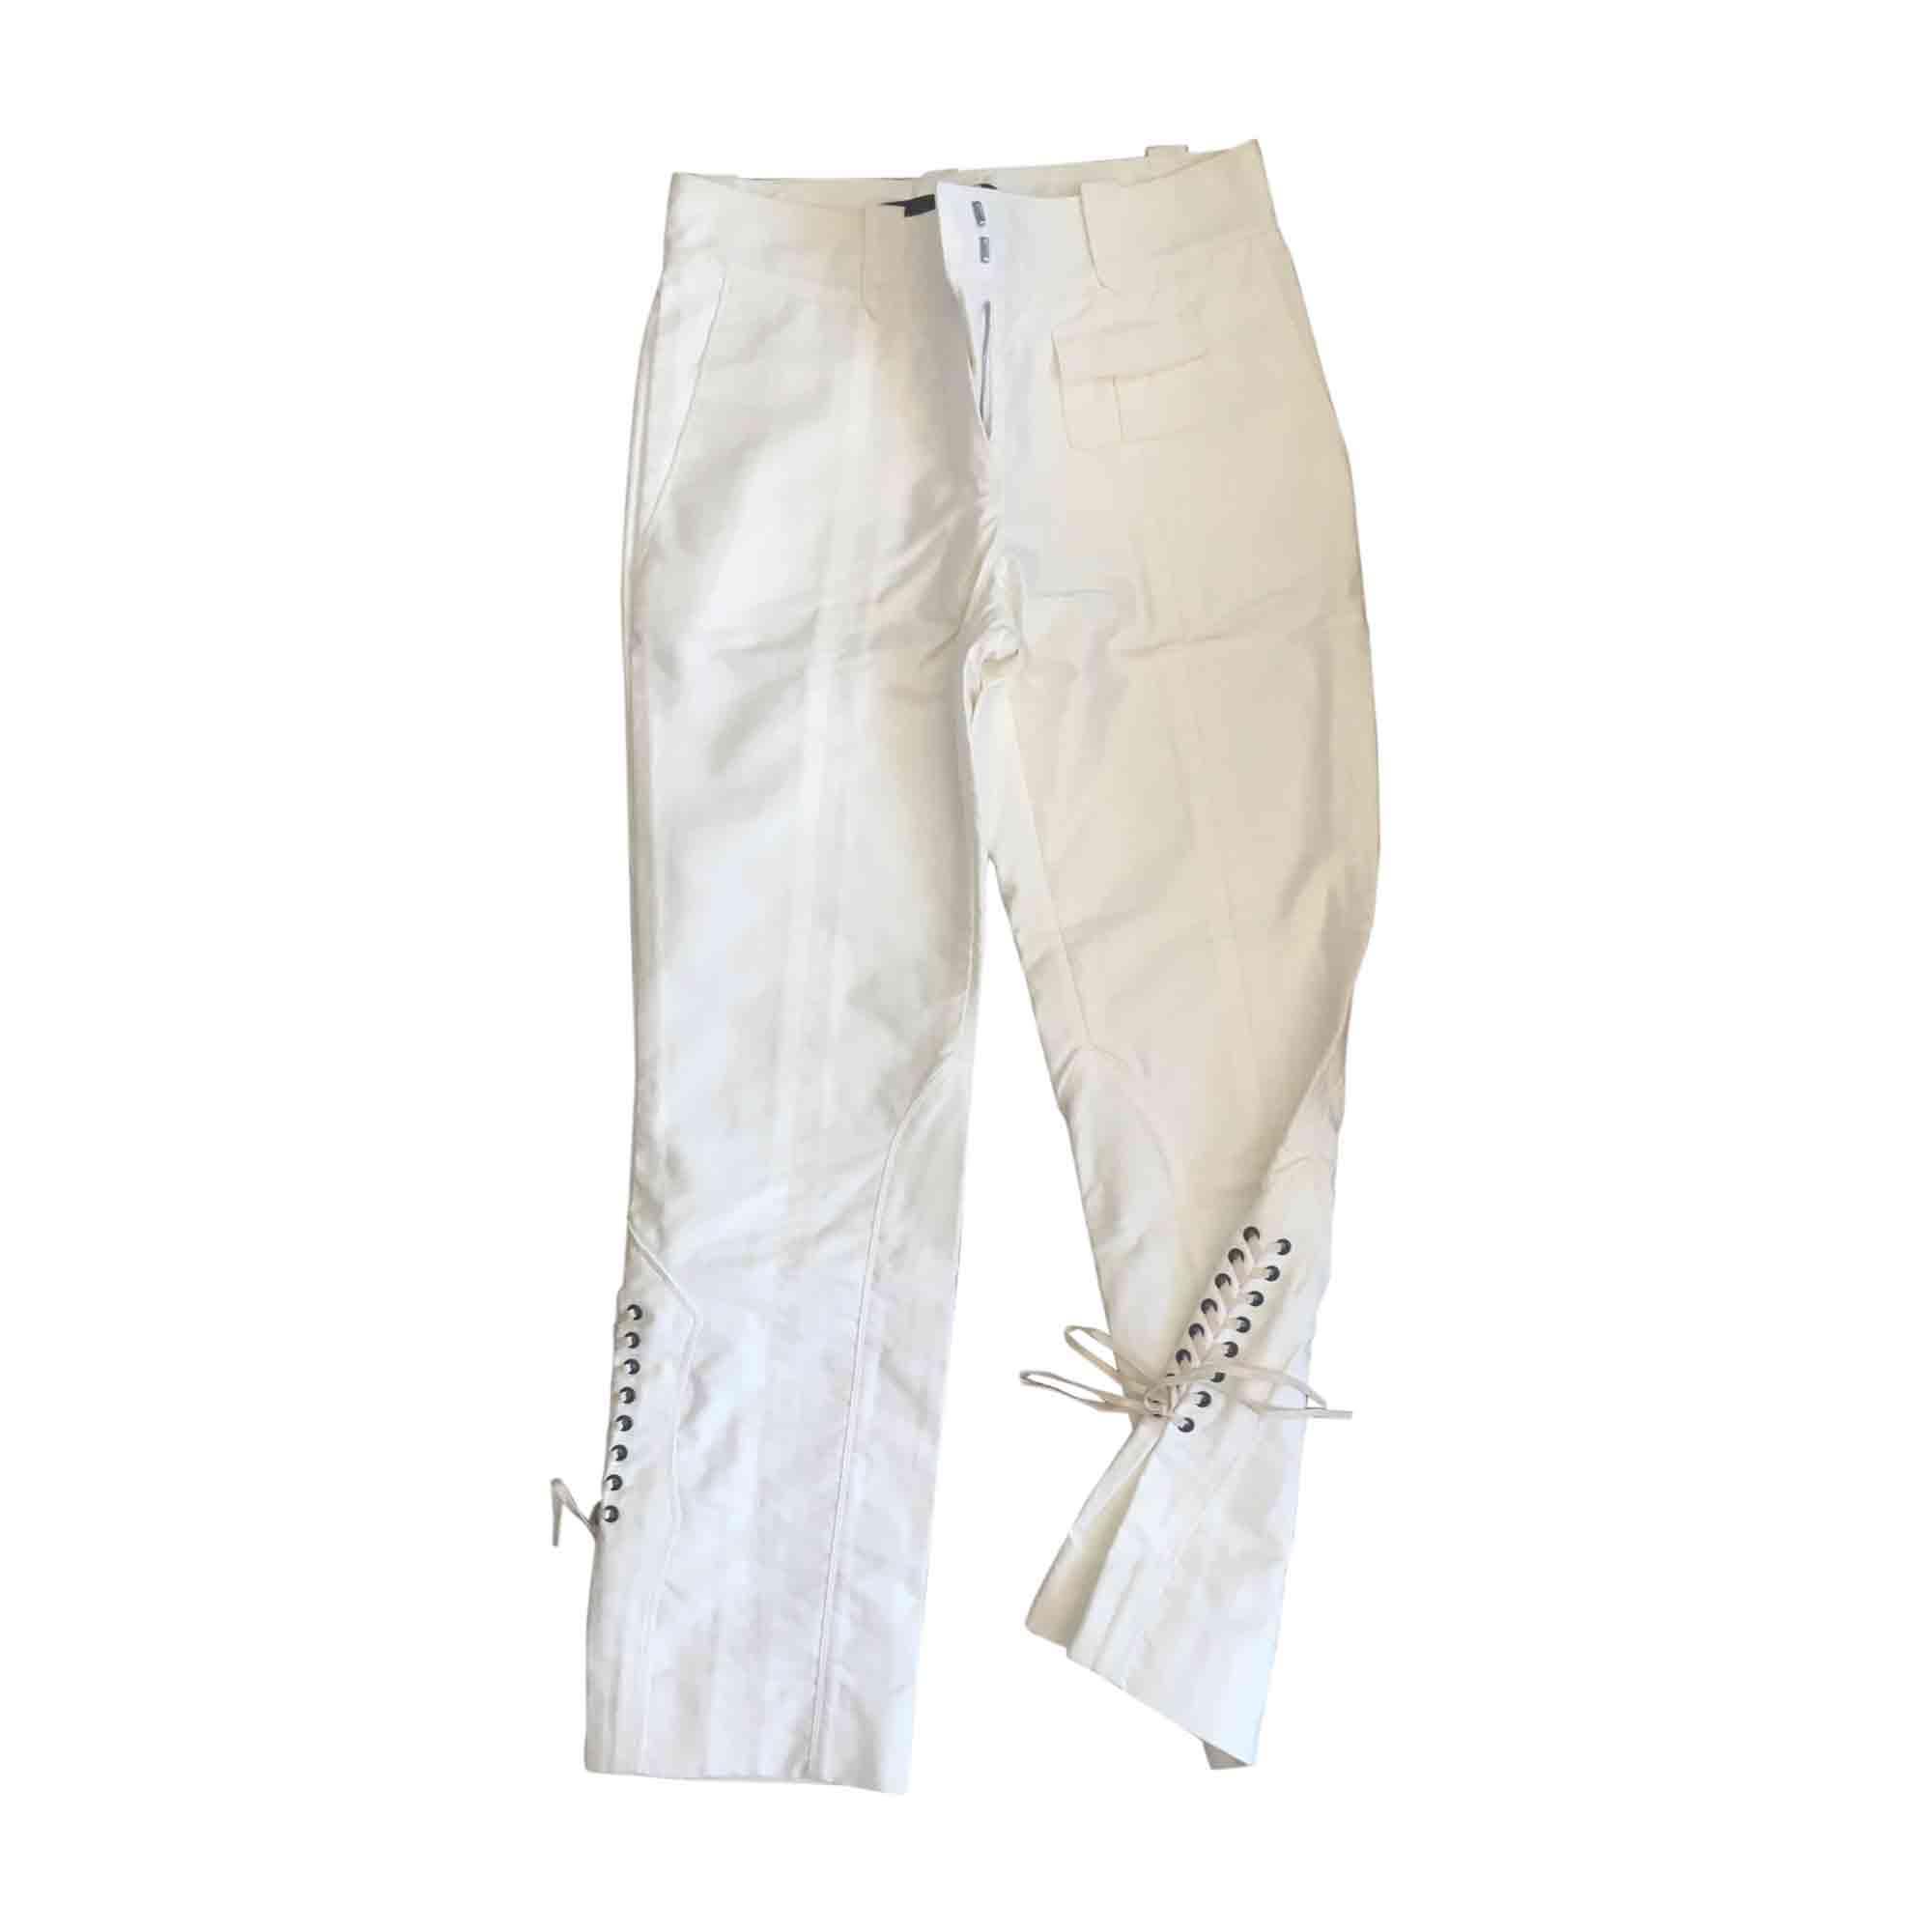 Pantalon droit LOUIS VUITTON Blanc, blanc cassé, écru